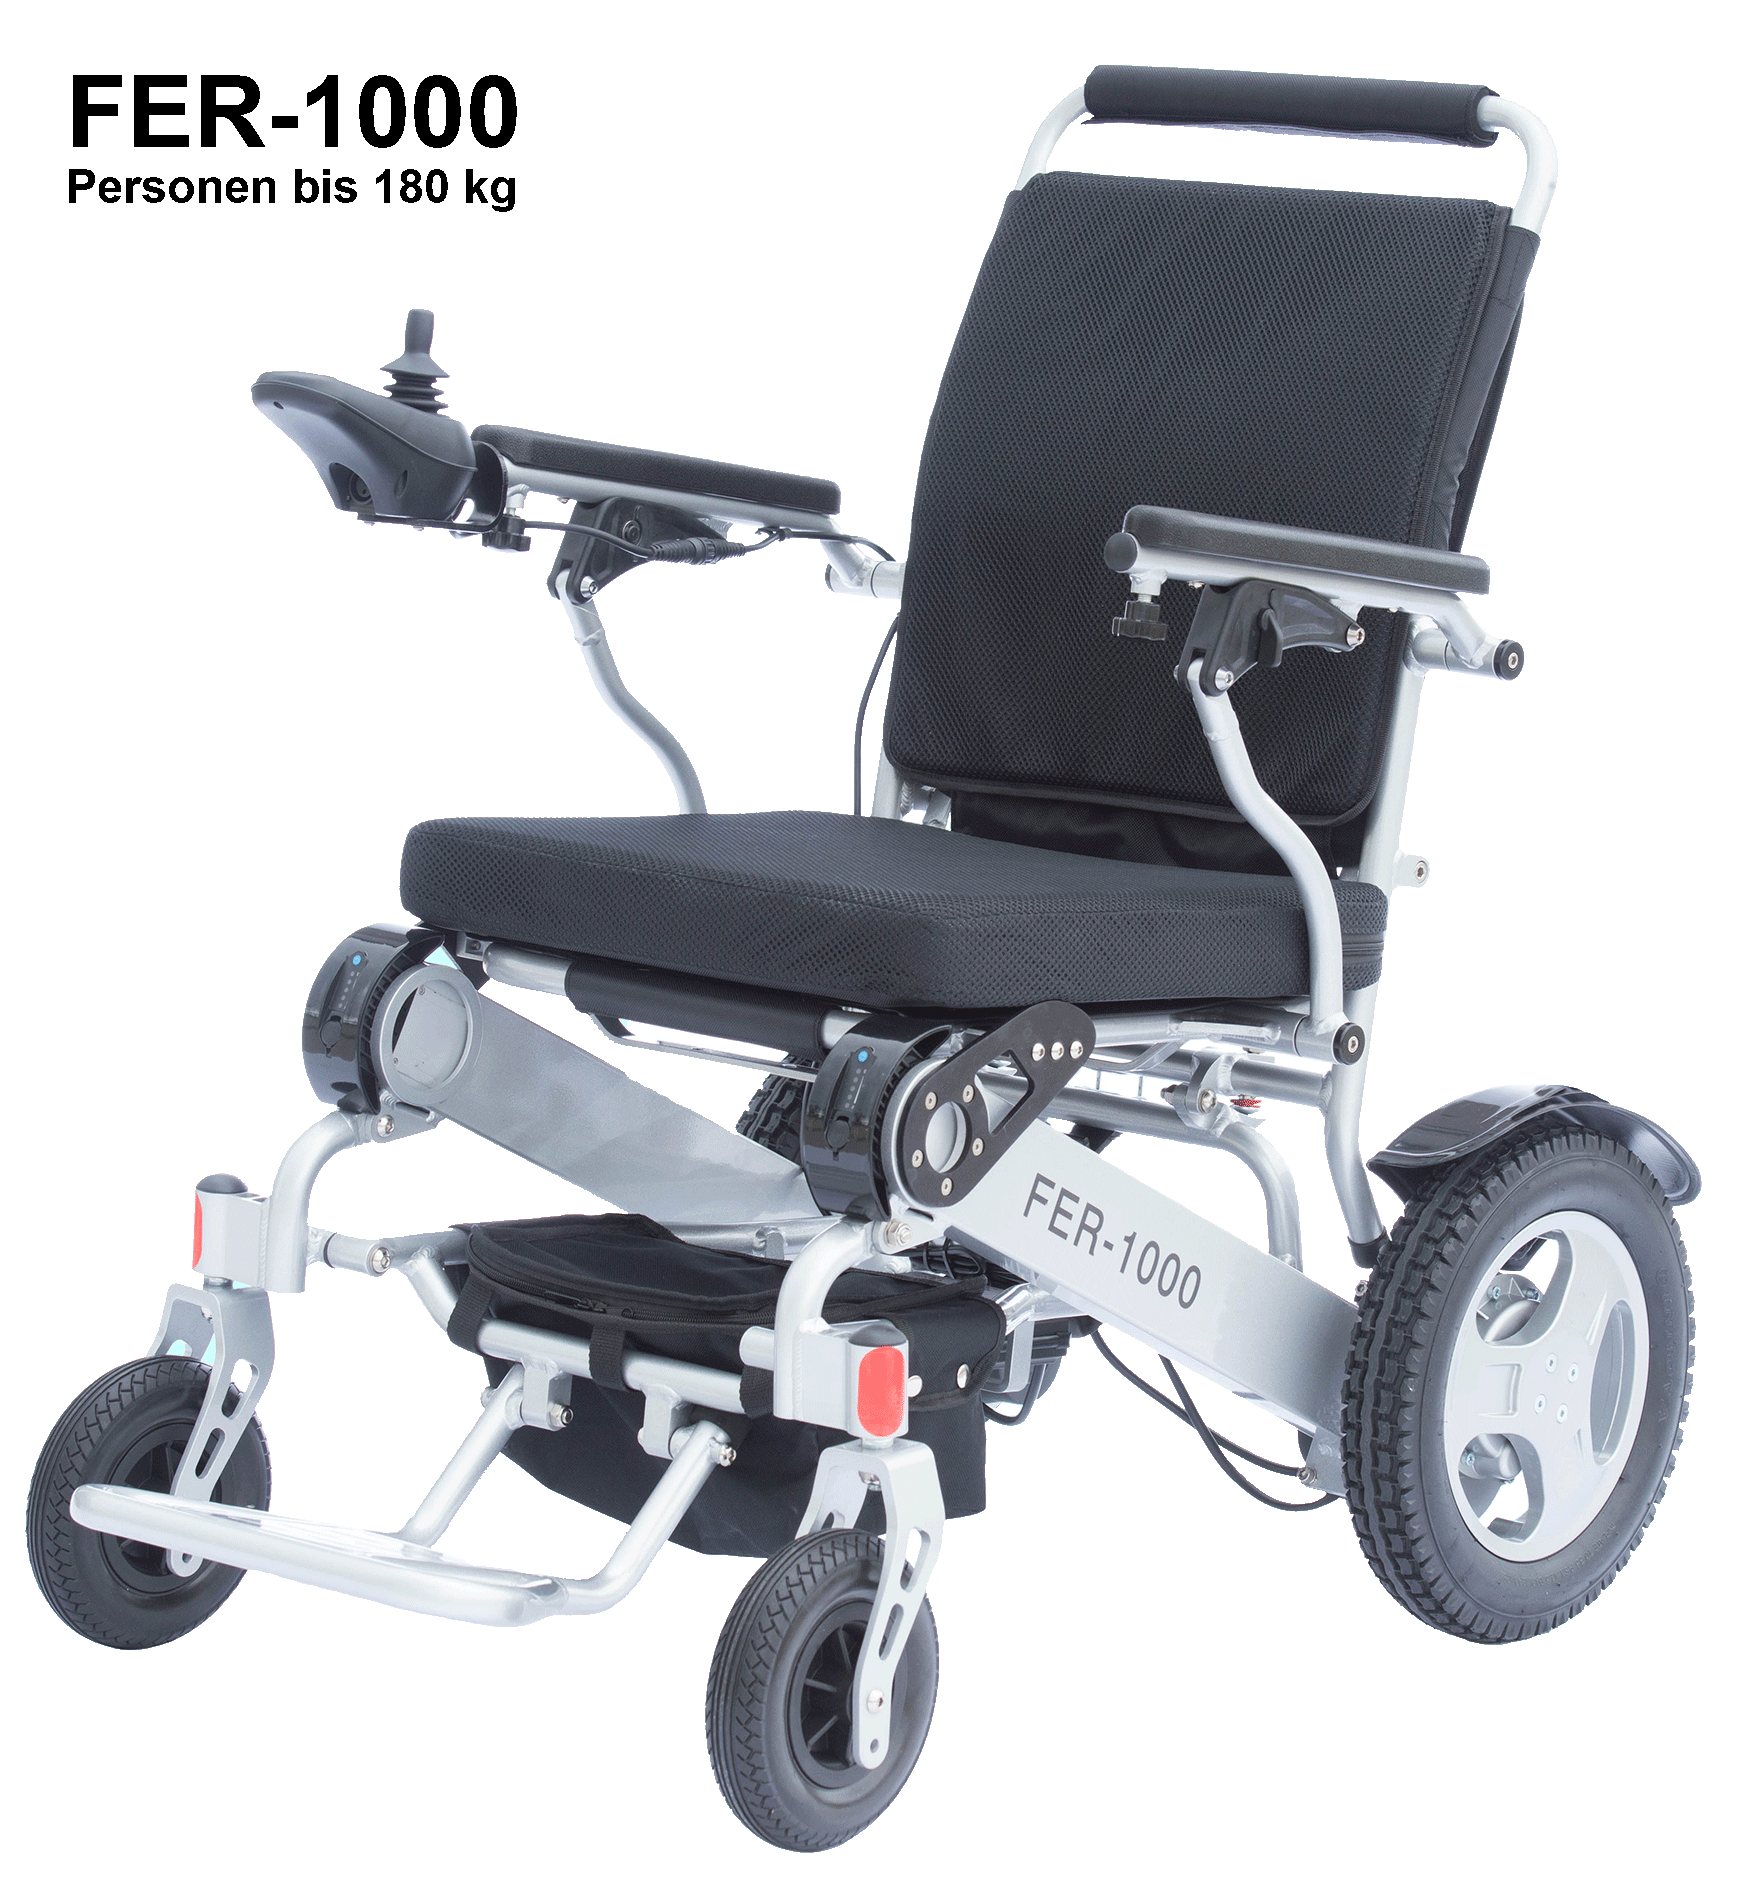 Electric Wheelchair FER-1000